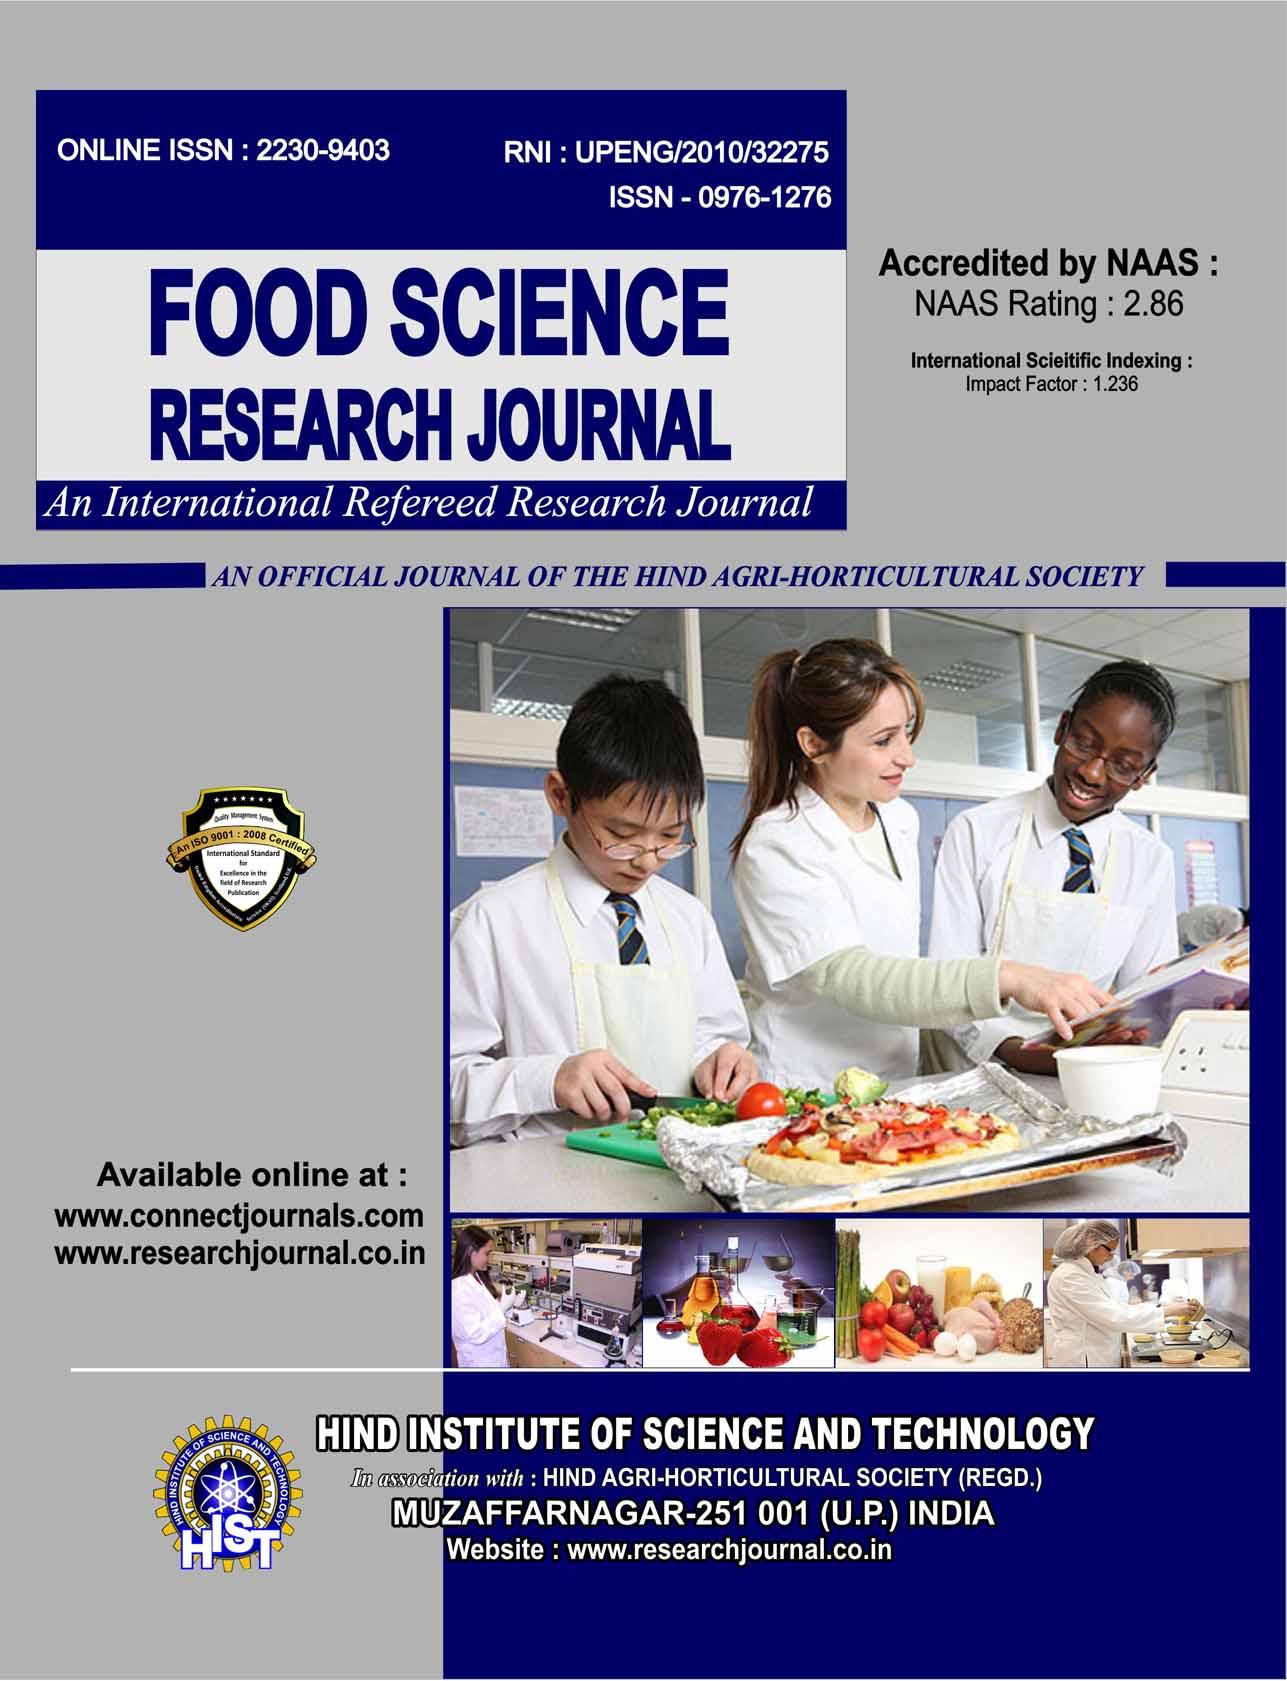 Food Sci. Res. J